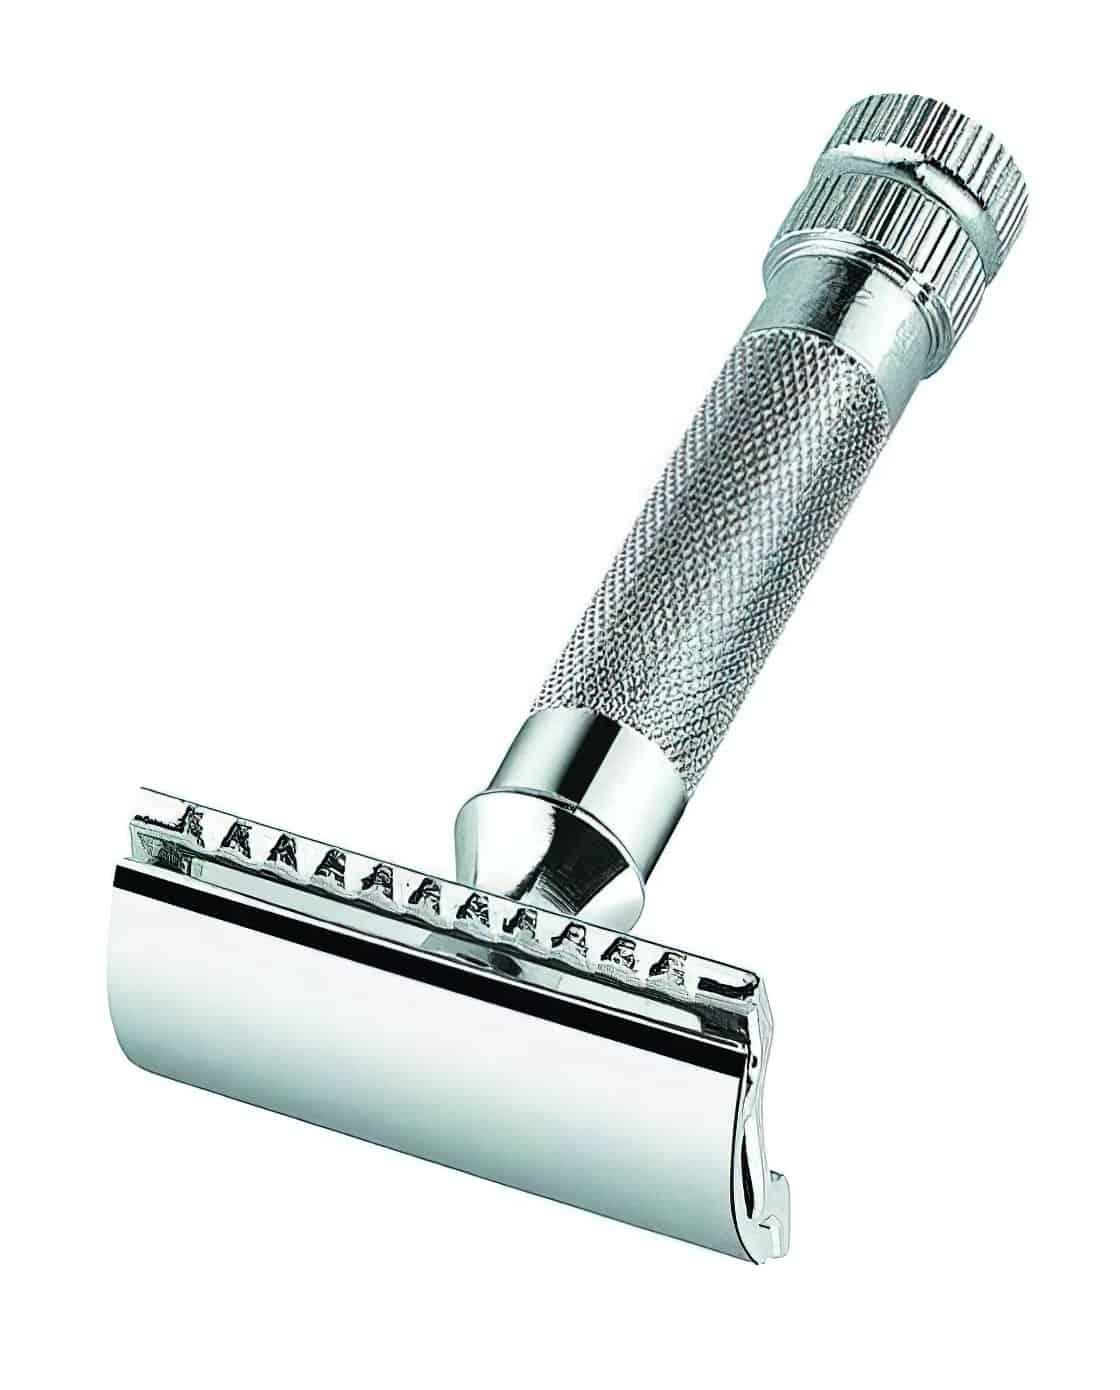 classic safety razor